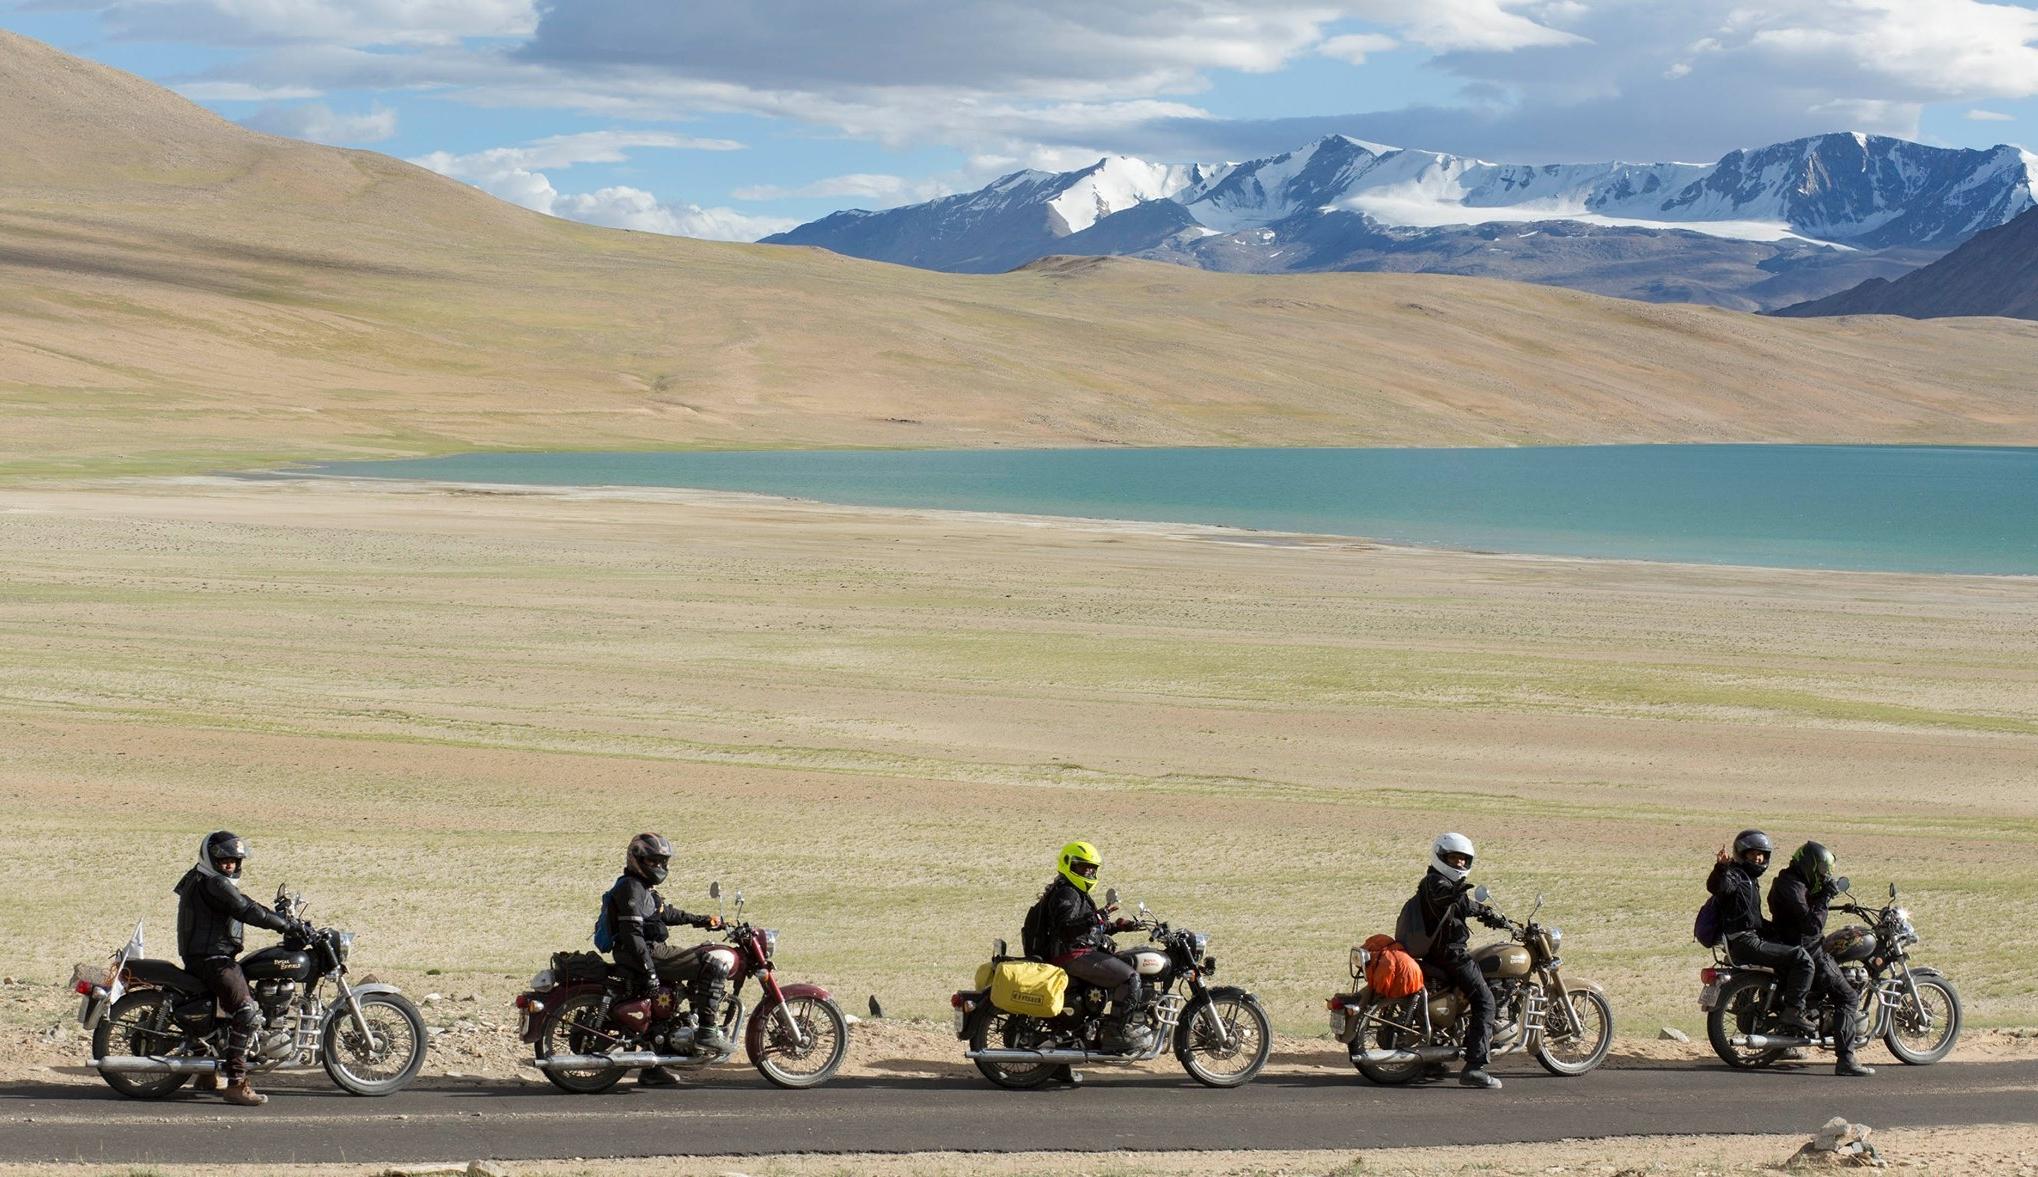 The bike caravan